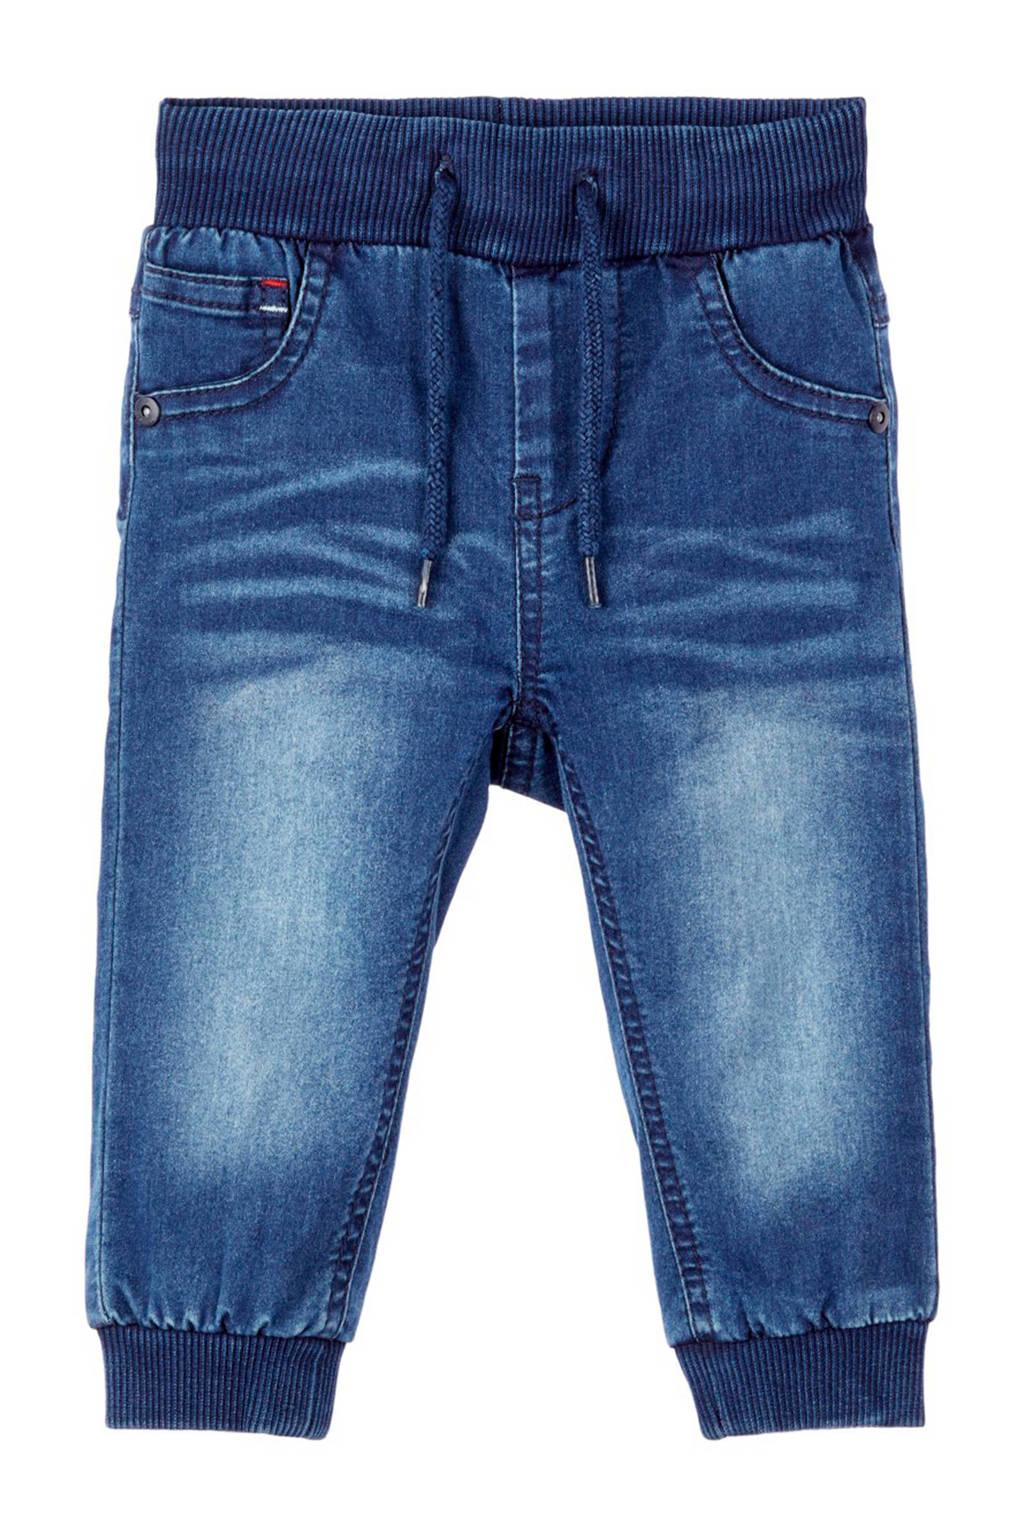 NAME IT BABY baby regular fit jeans Romeo medium blue denim, Medium blue denim